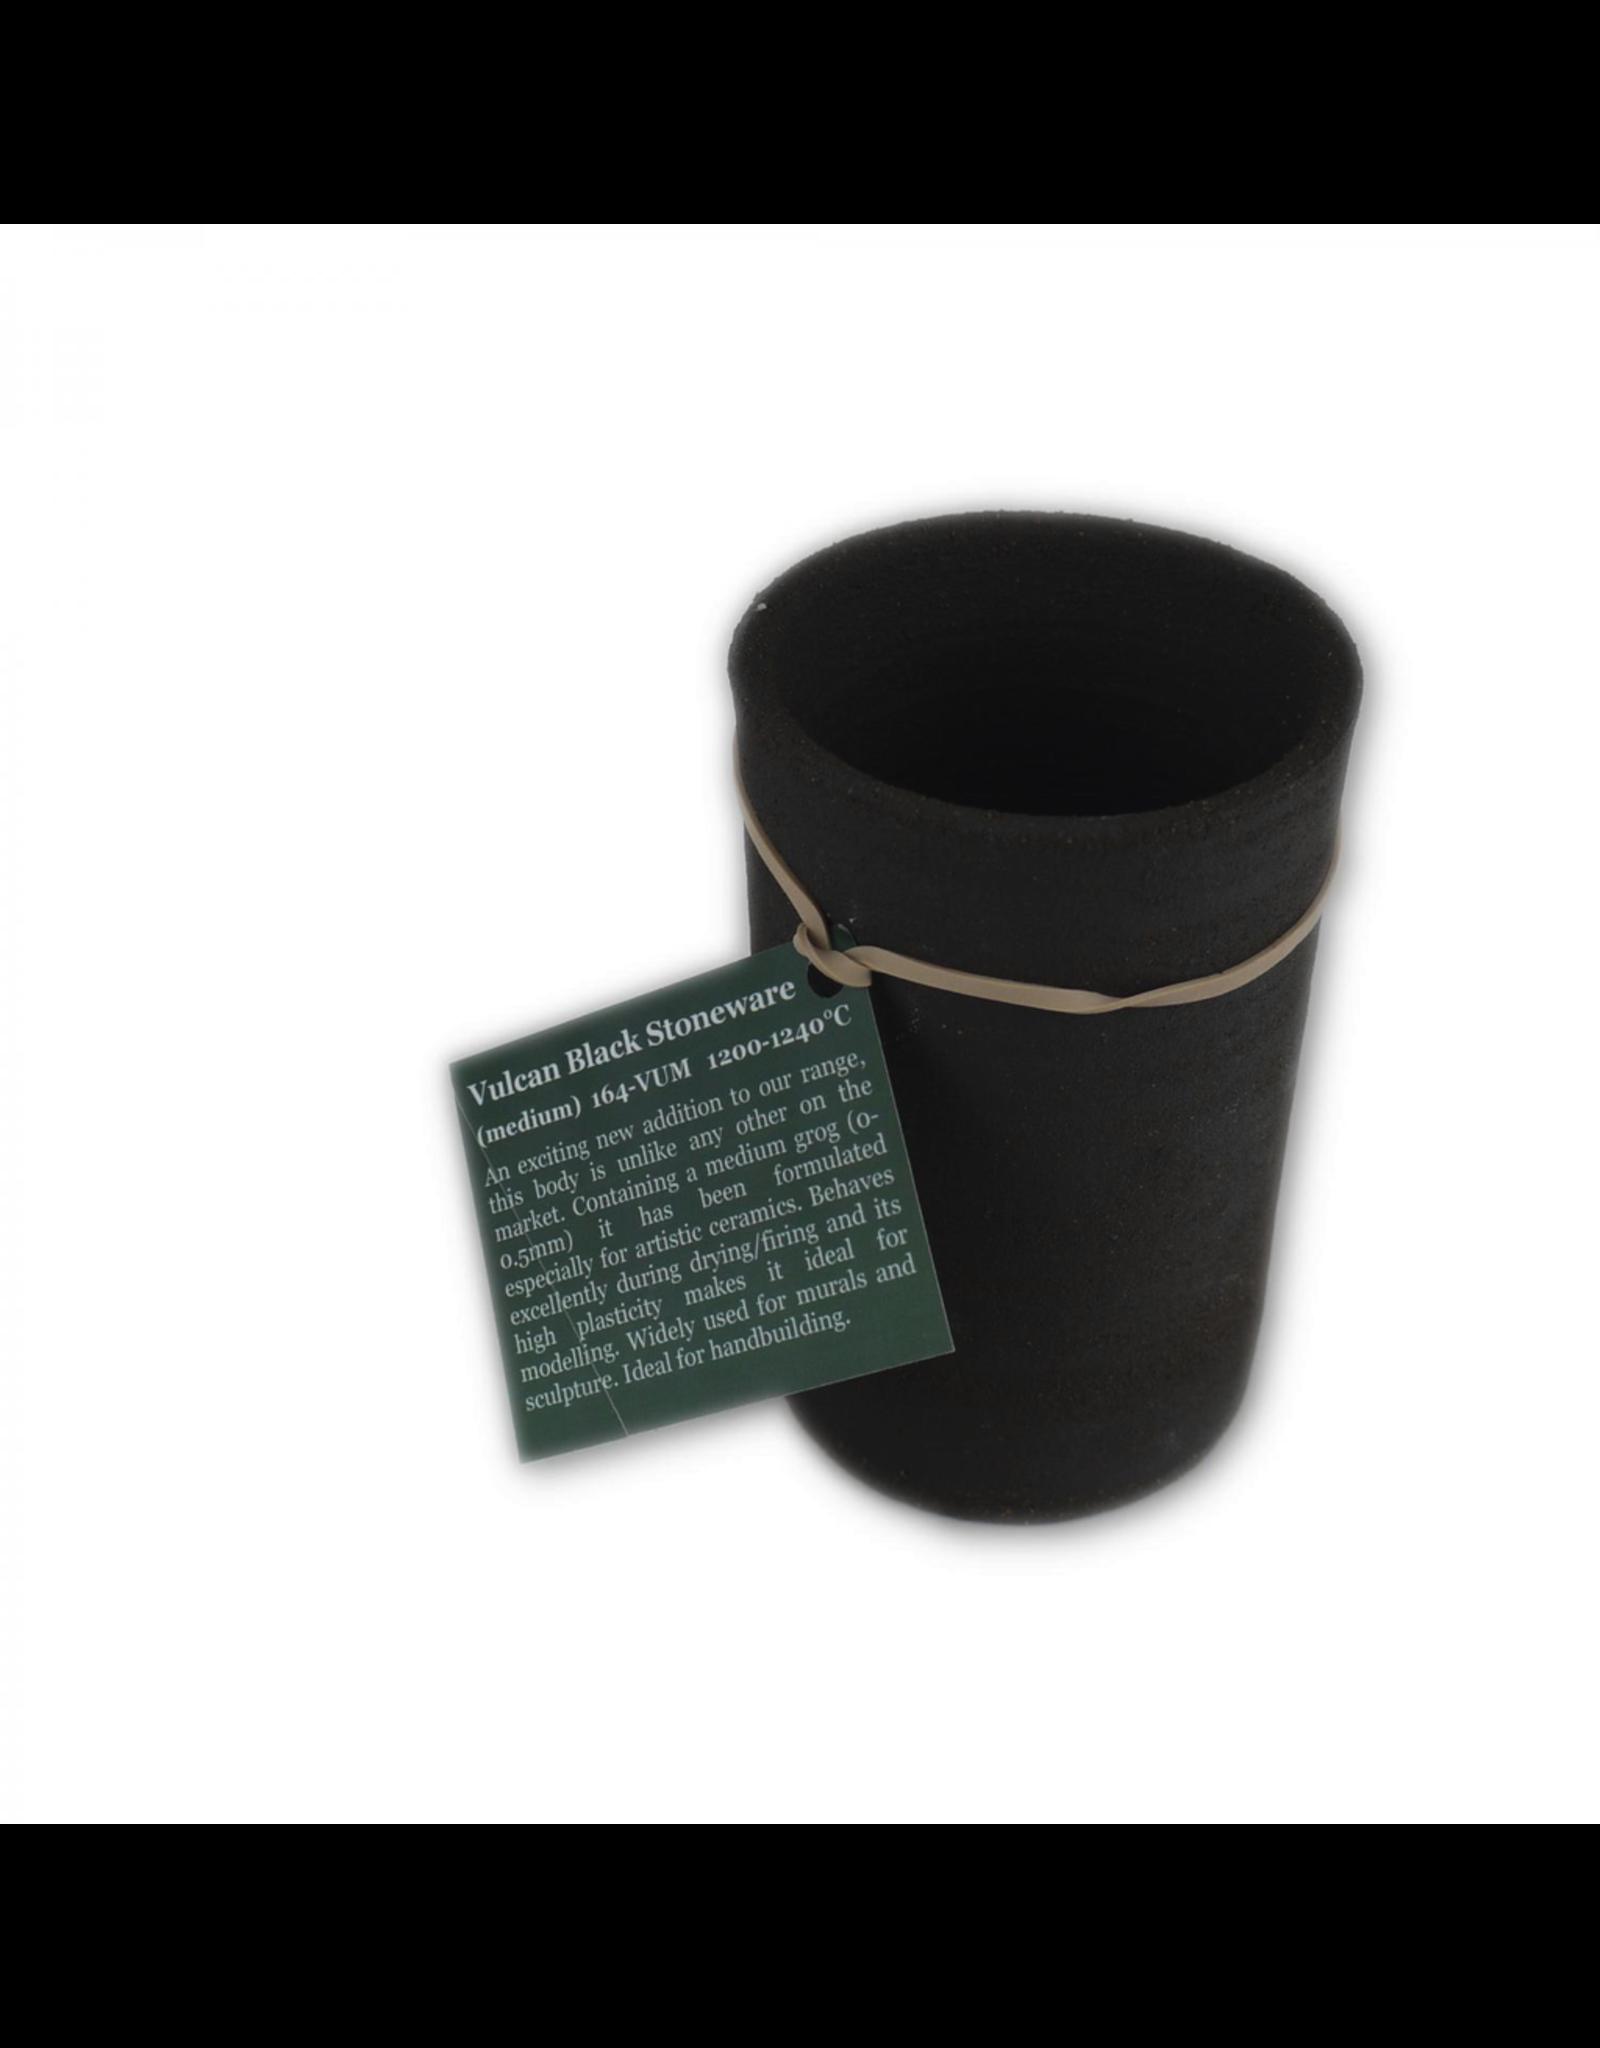 Potclays Vulcan Black Stoneware (Medium) 1200-1260°C